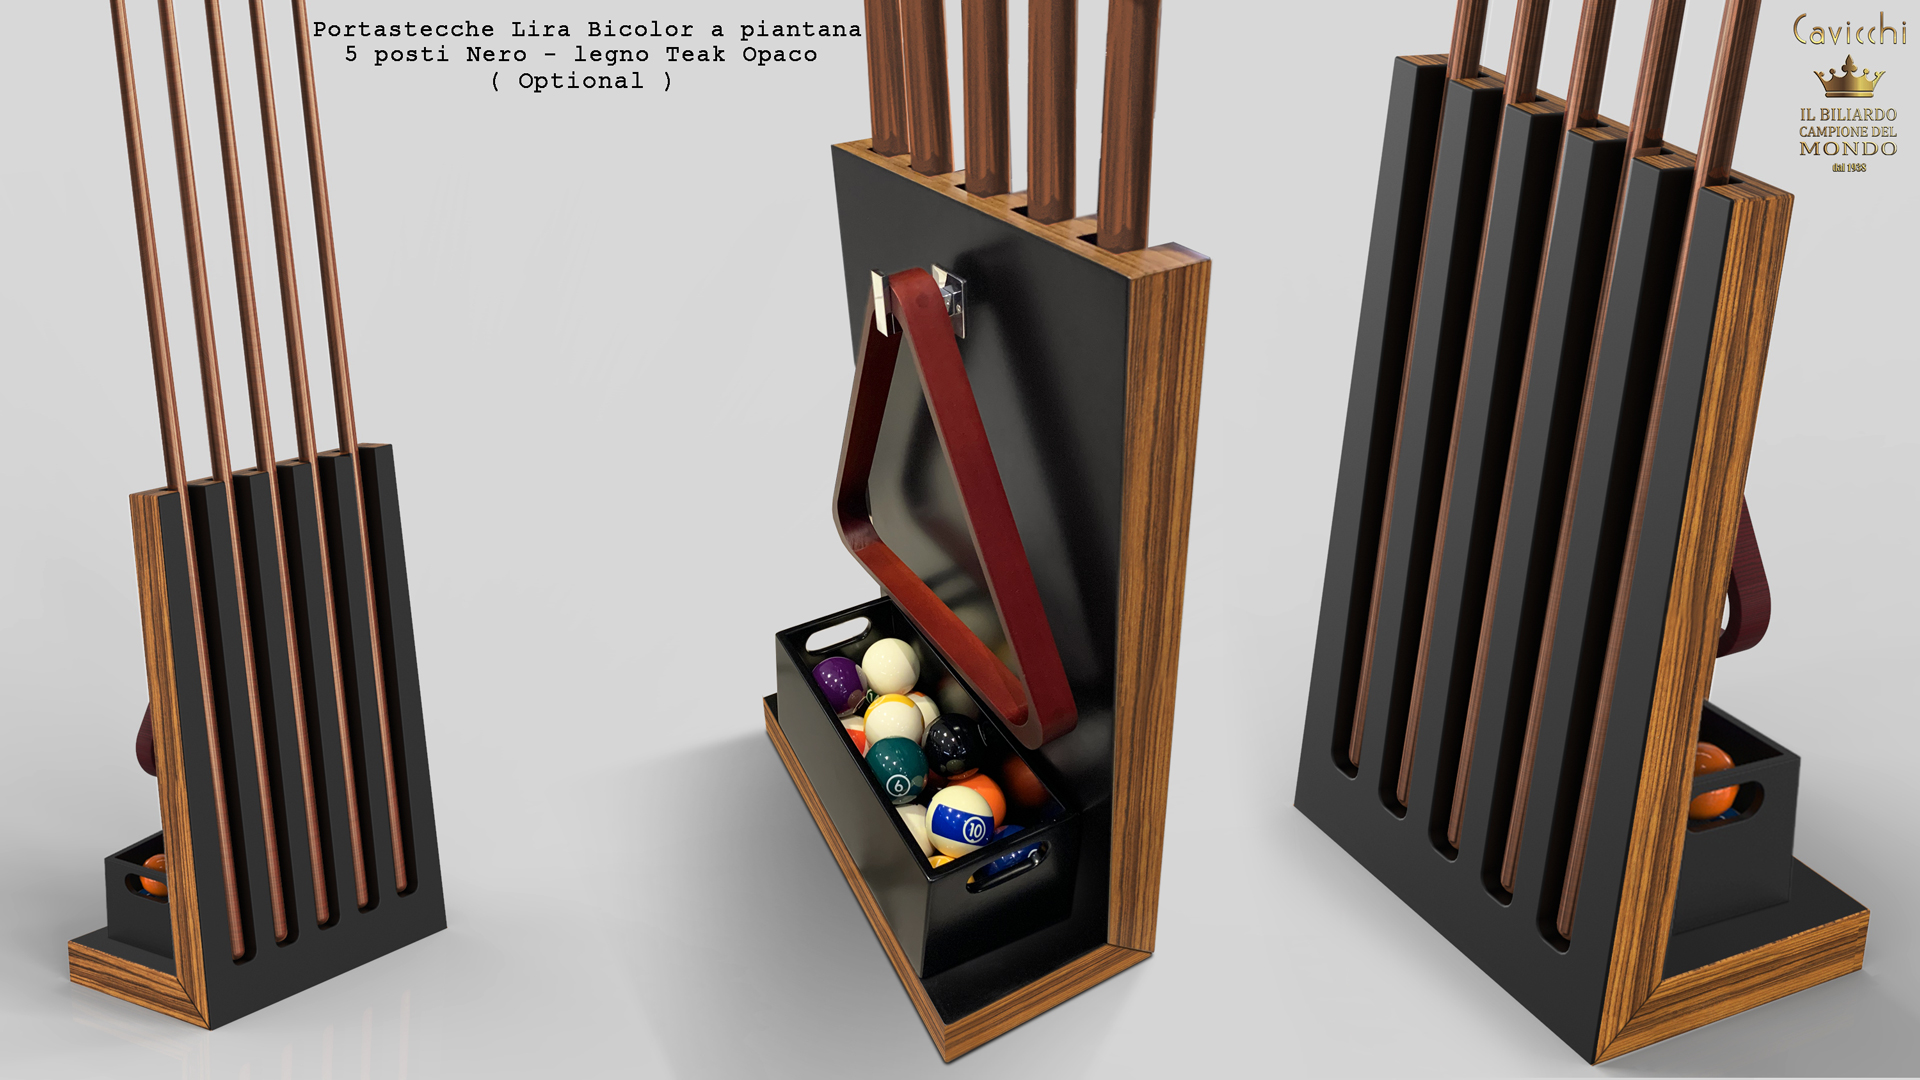 Pool Table Mod. Cayenne Two Bicolor Teak / Walnut Version 13